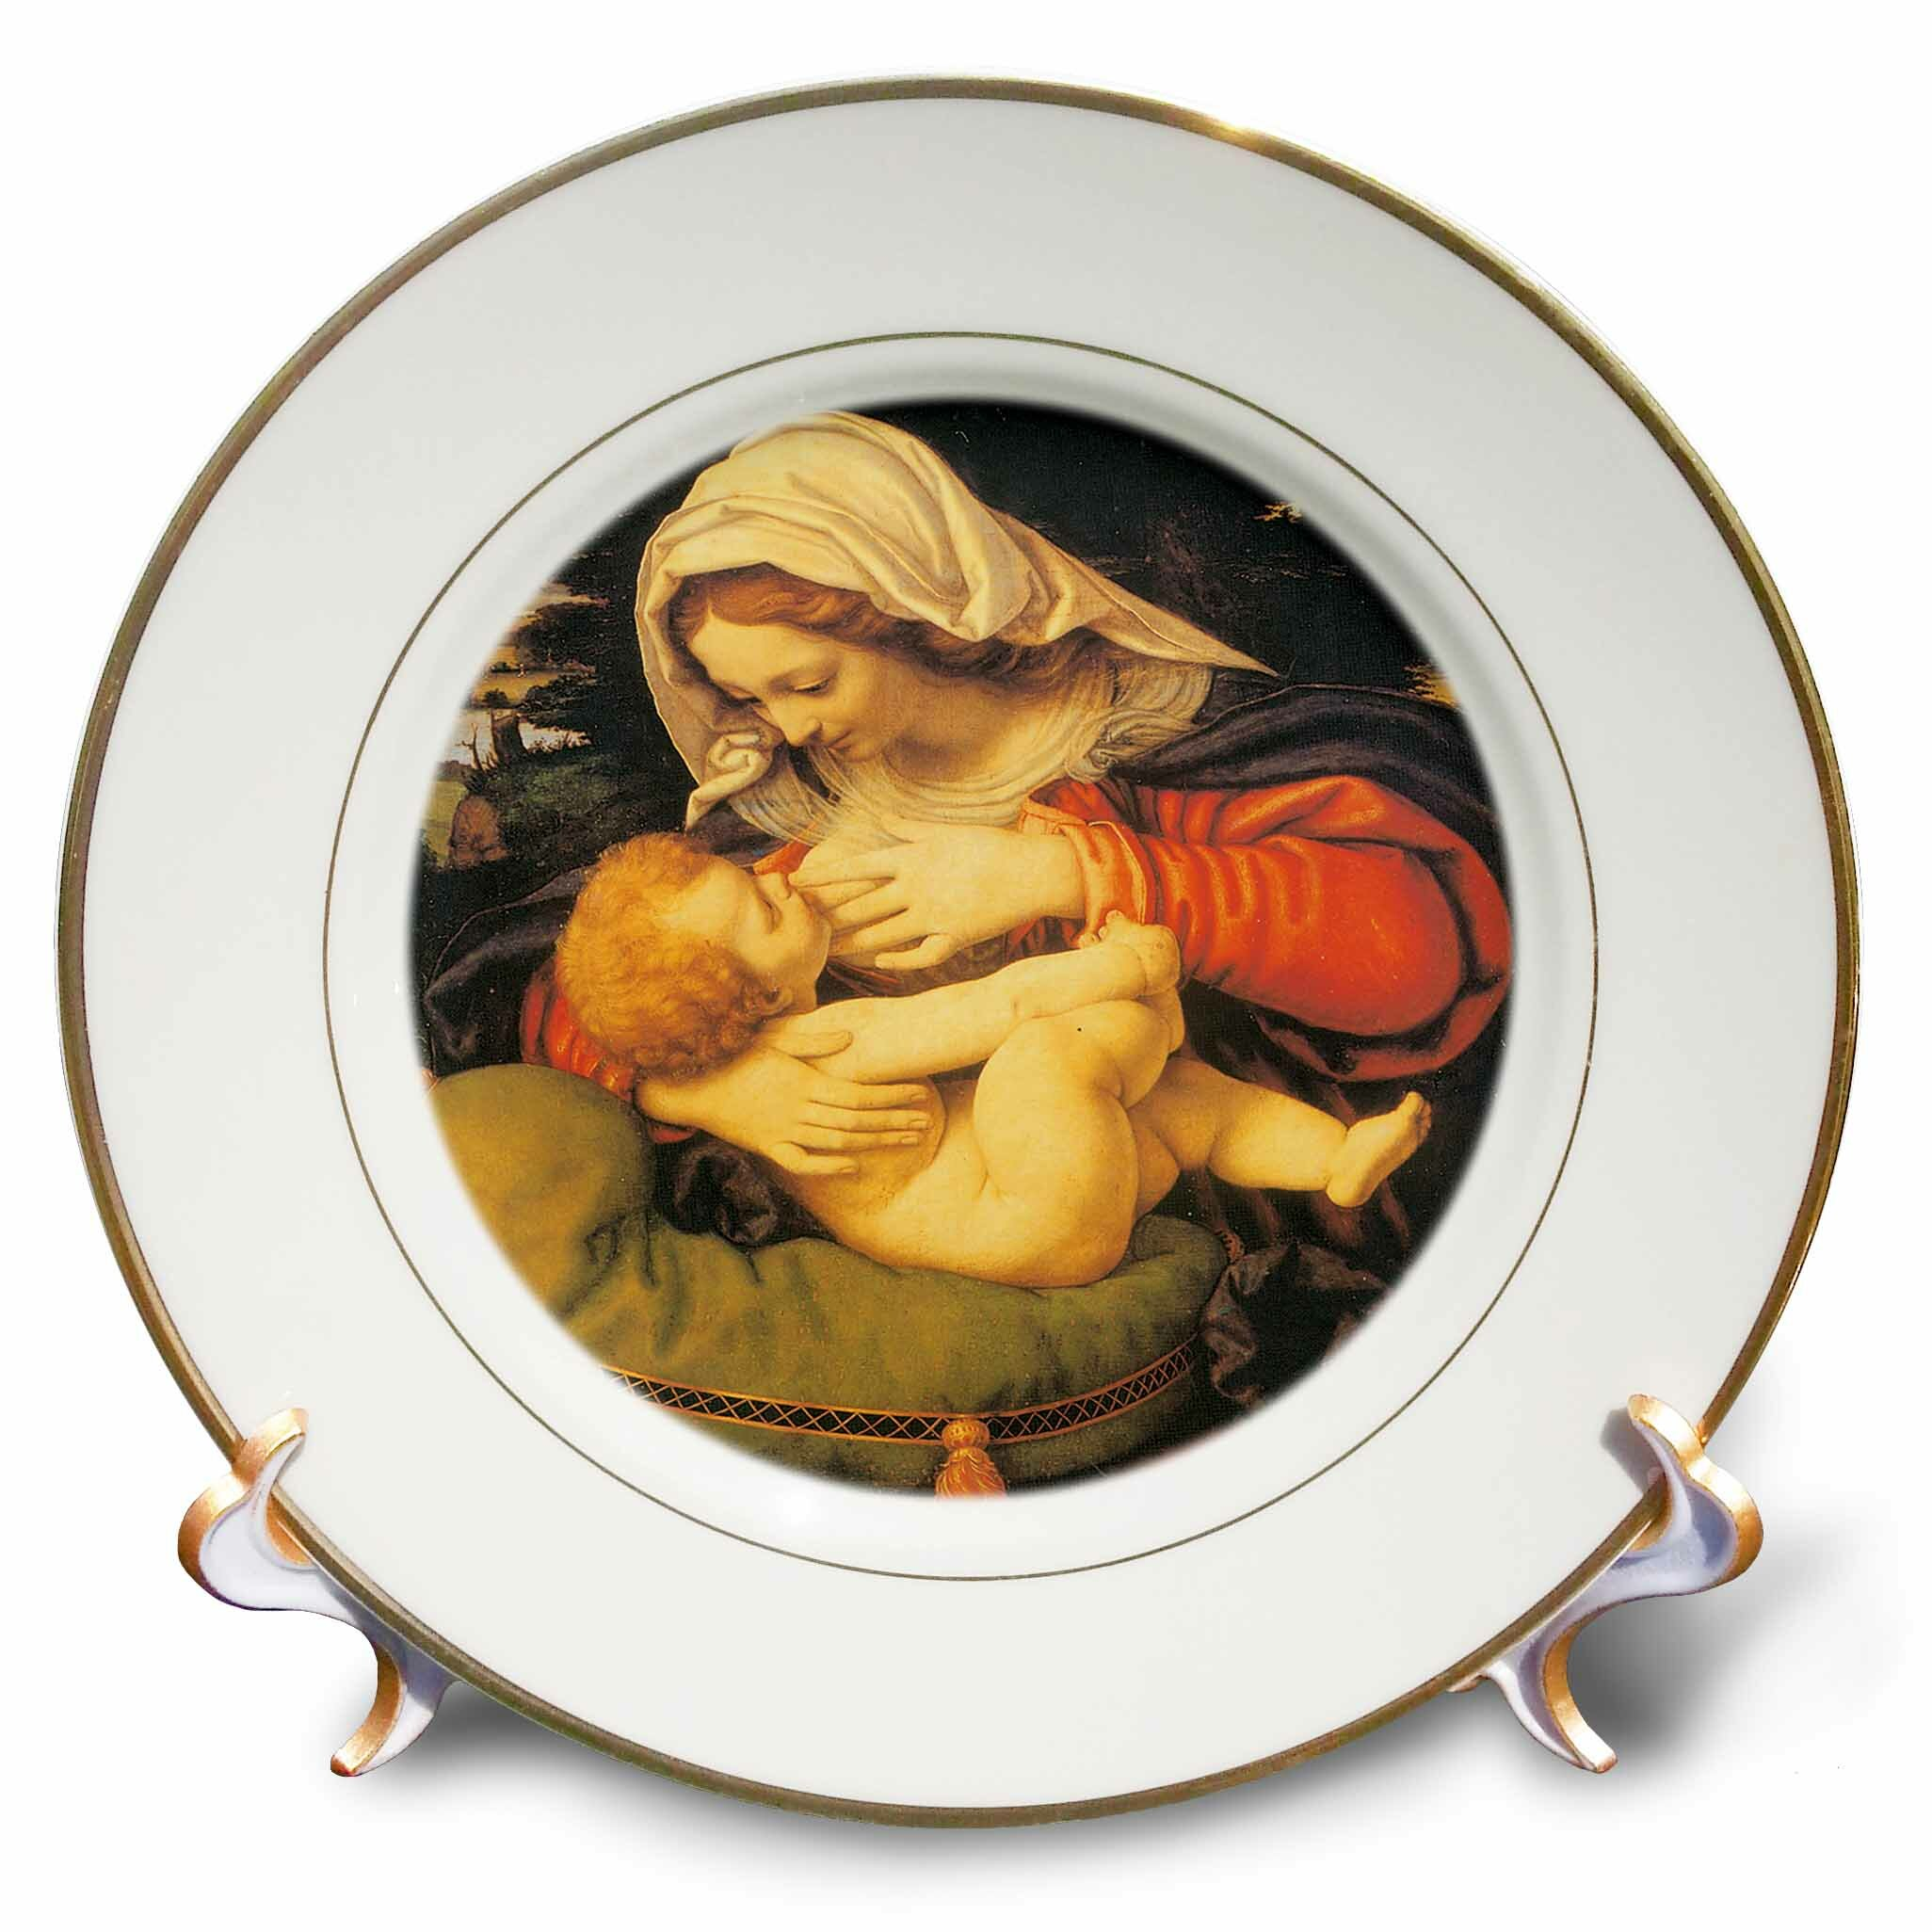 East Urban Home Madonna With The Cushion By Andra Solari Porcelain Decorative Plate Wayfair